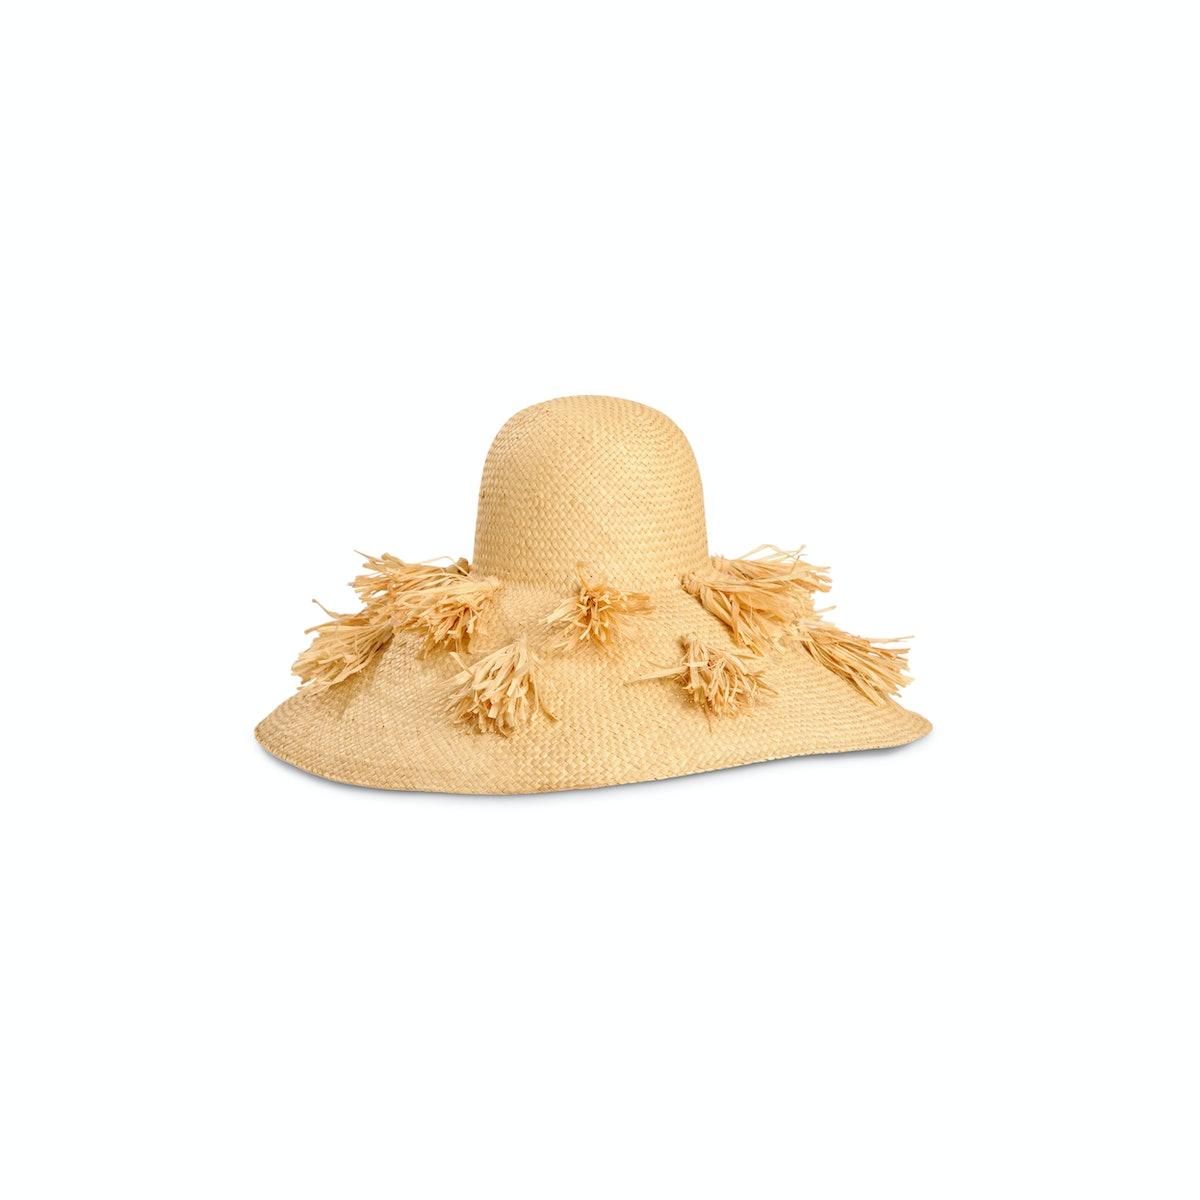 Preston and Olivia Ursula hat